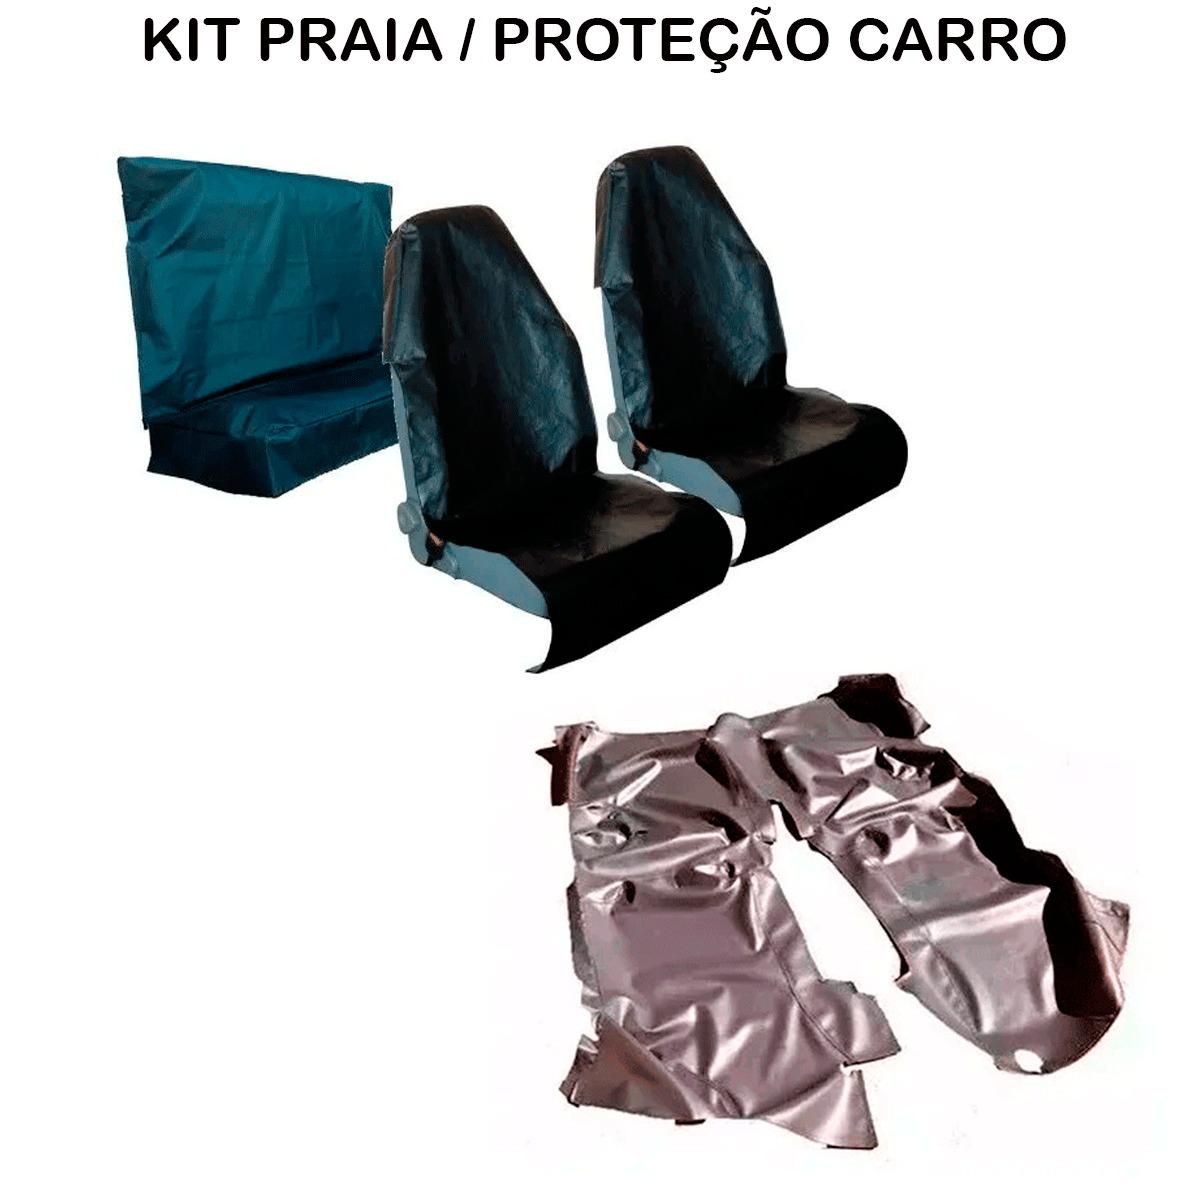 Tapete Em Vinil Volkswagen Polo 97 a 2001 + Capa Banco Protecao Banco Areia Suor Academia